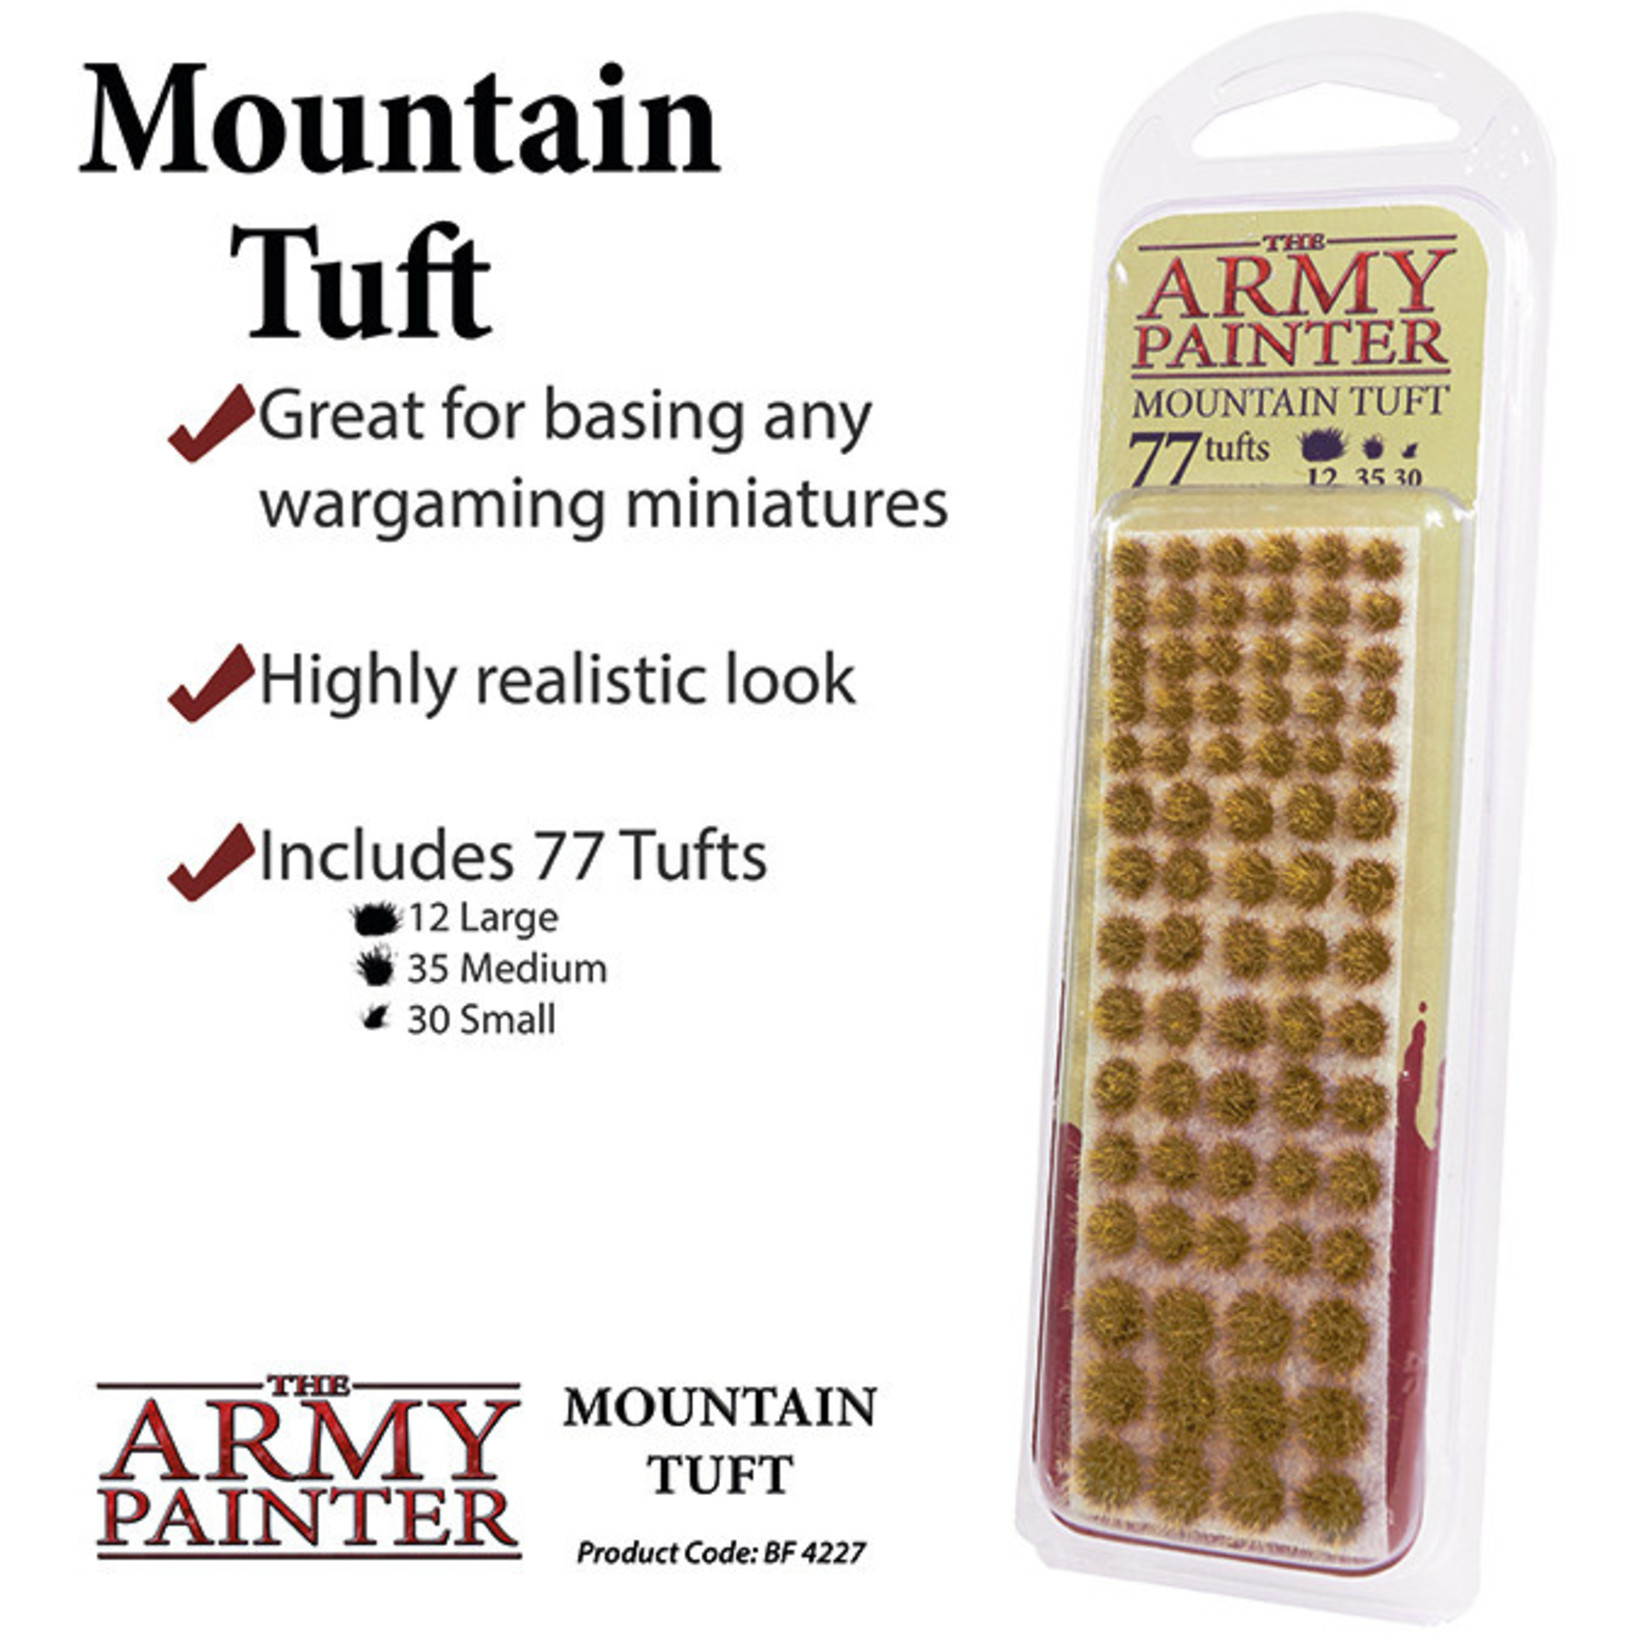 The Army Painter Battlefields: Mountain Tuft (2019)